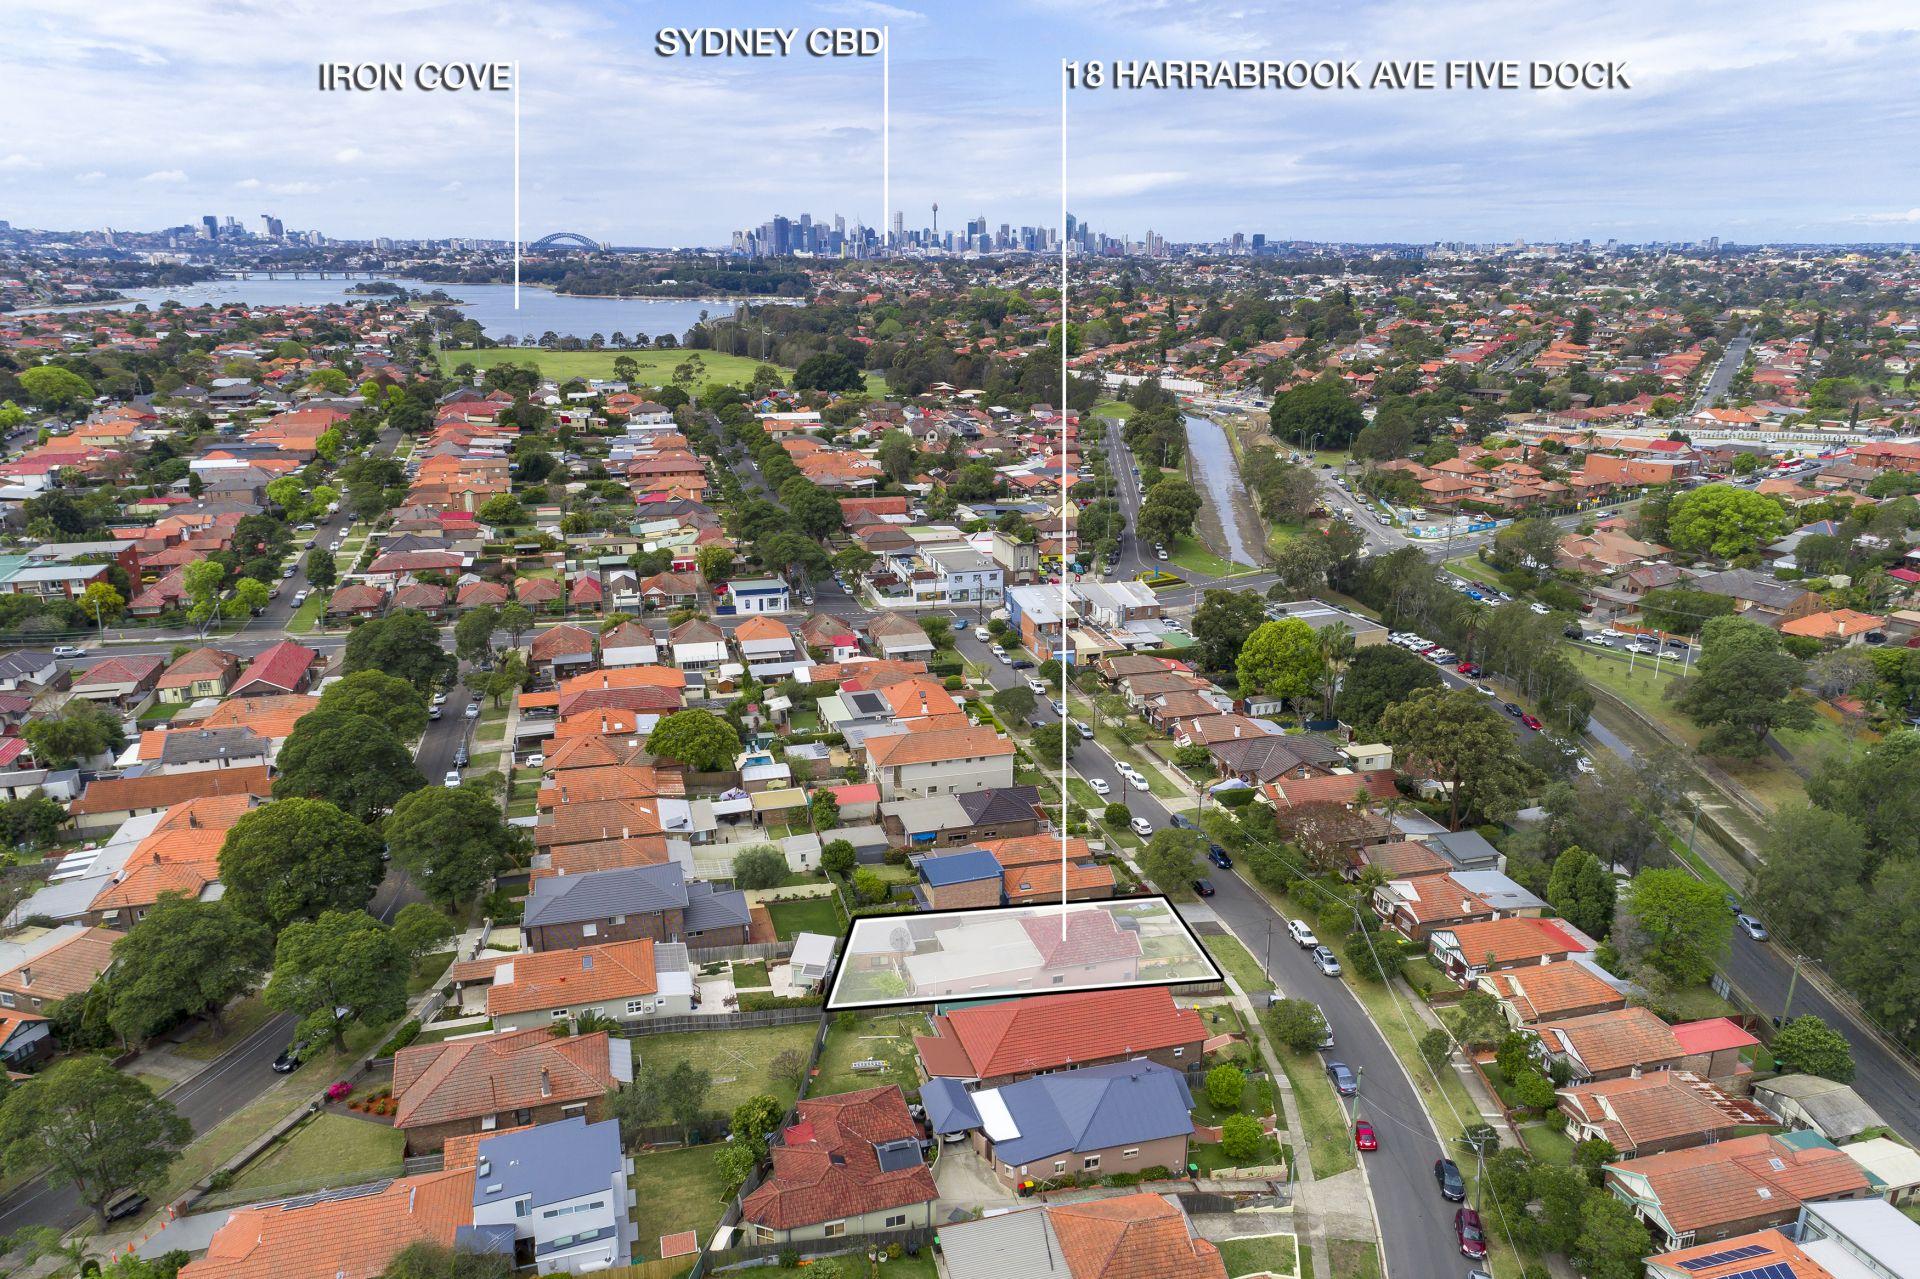 18 Harrabrook Avenue, Five Dock NSW